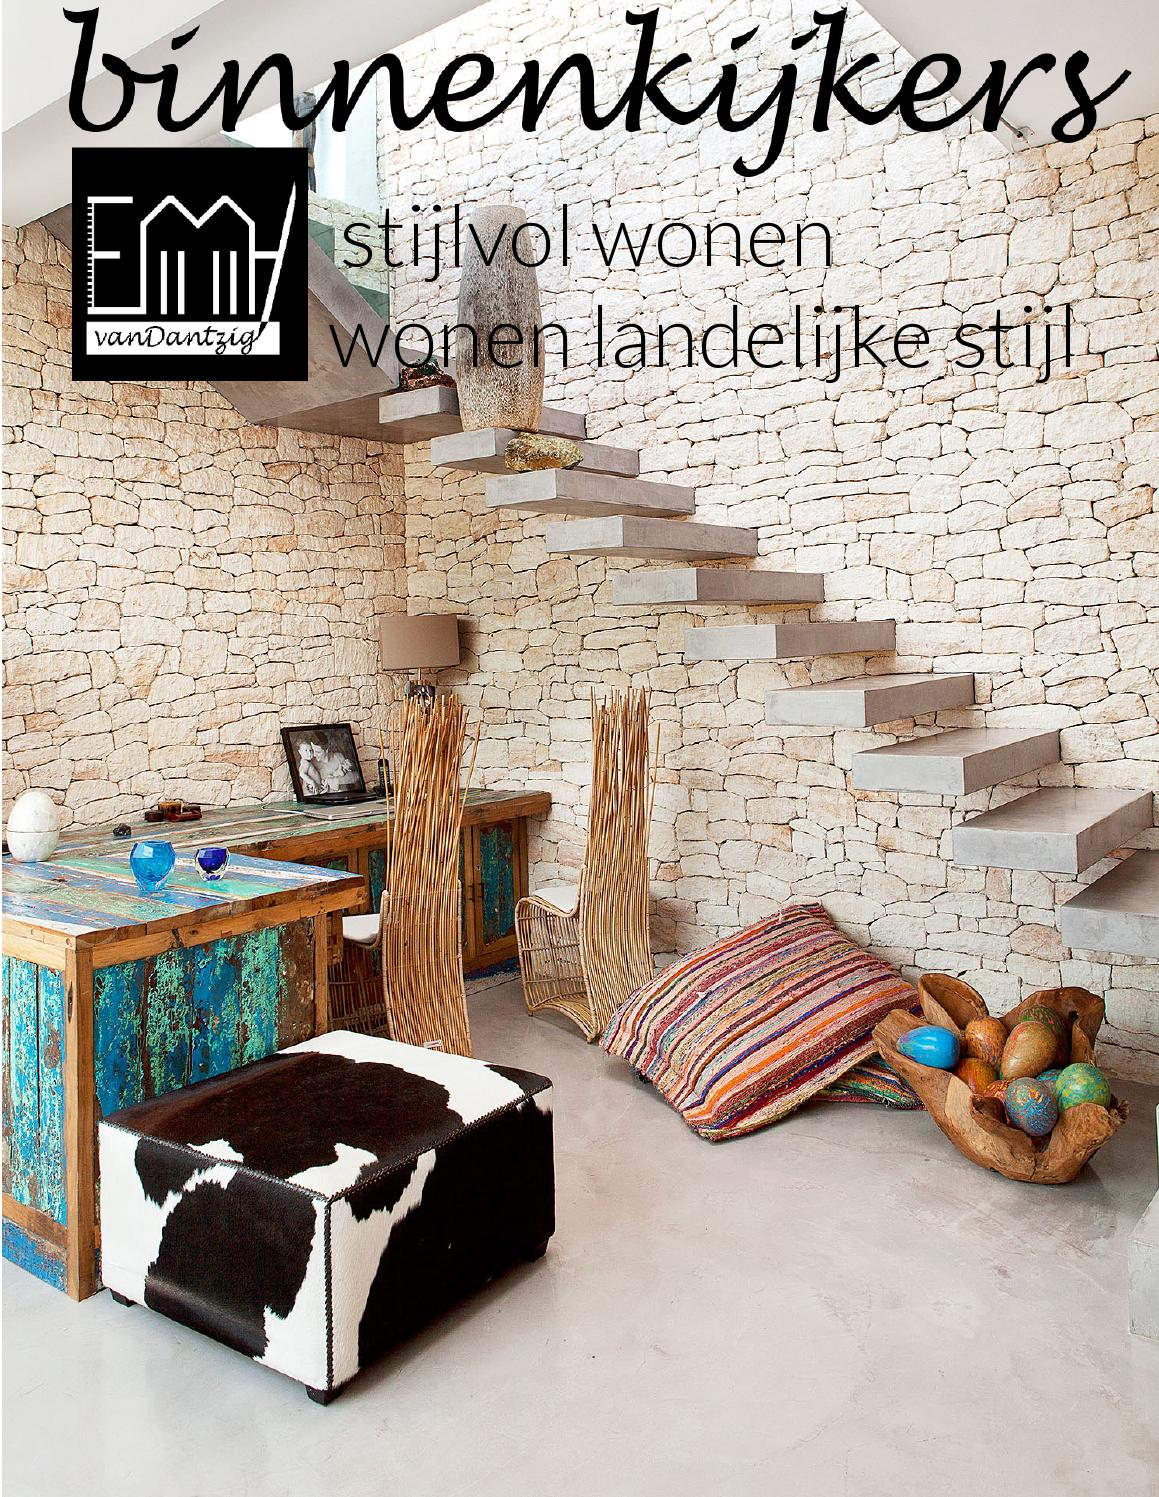 Woonstijl kersteditie 2012 by dmarc   issuu